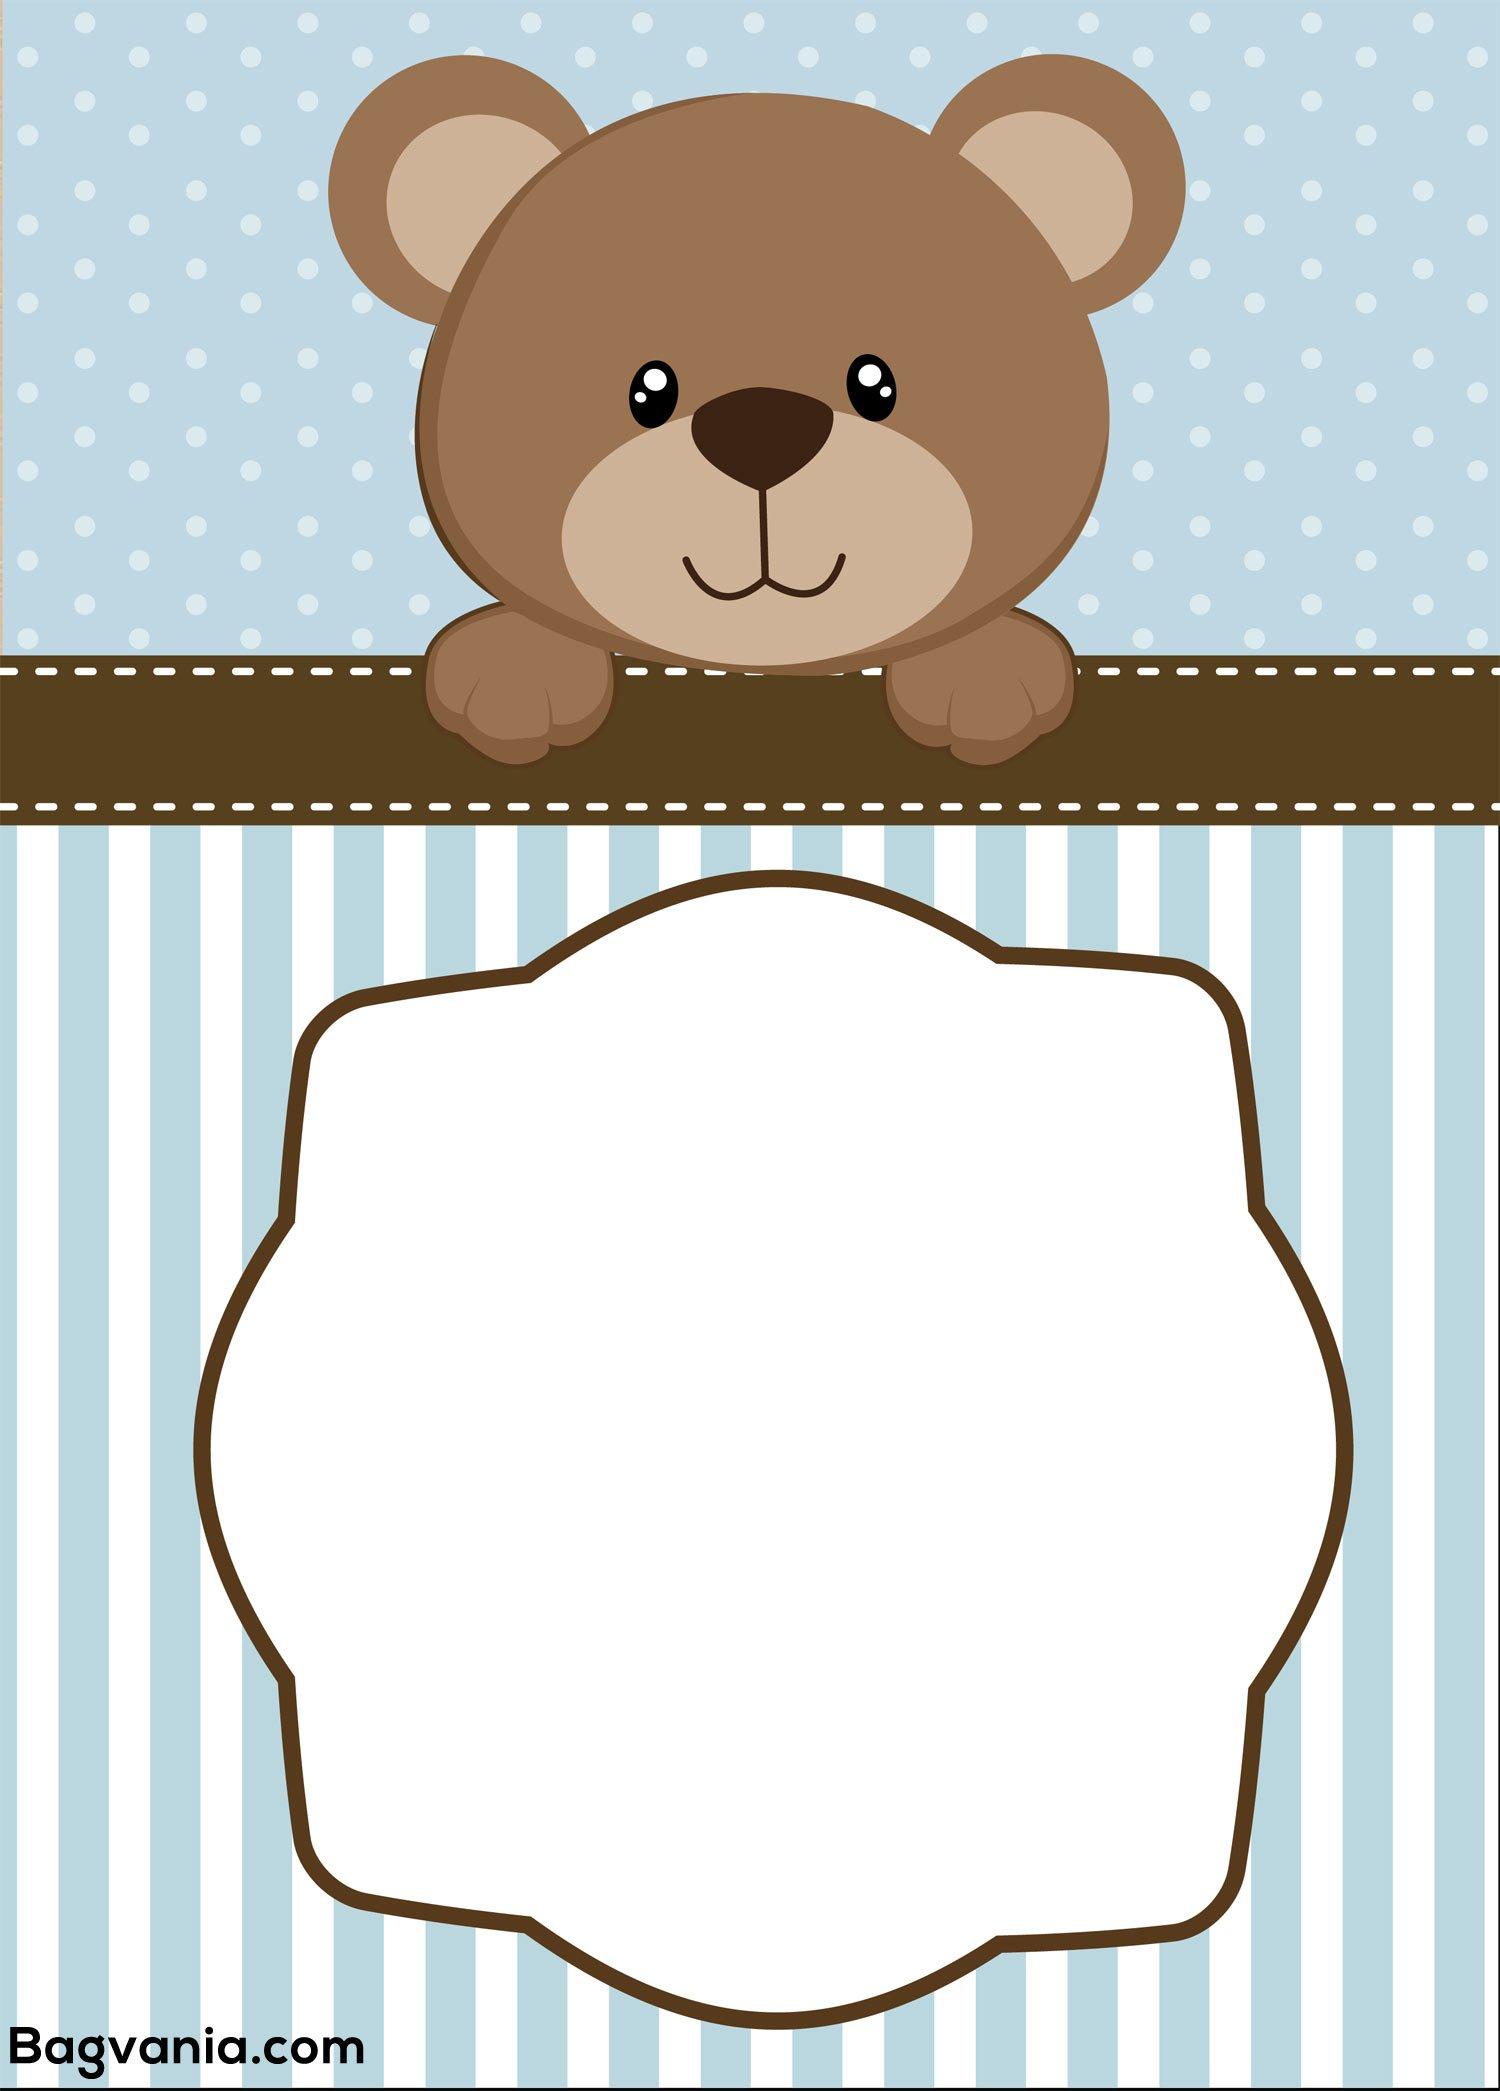 Free Teddy Bear Birthday Invitation Templates Bagvania